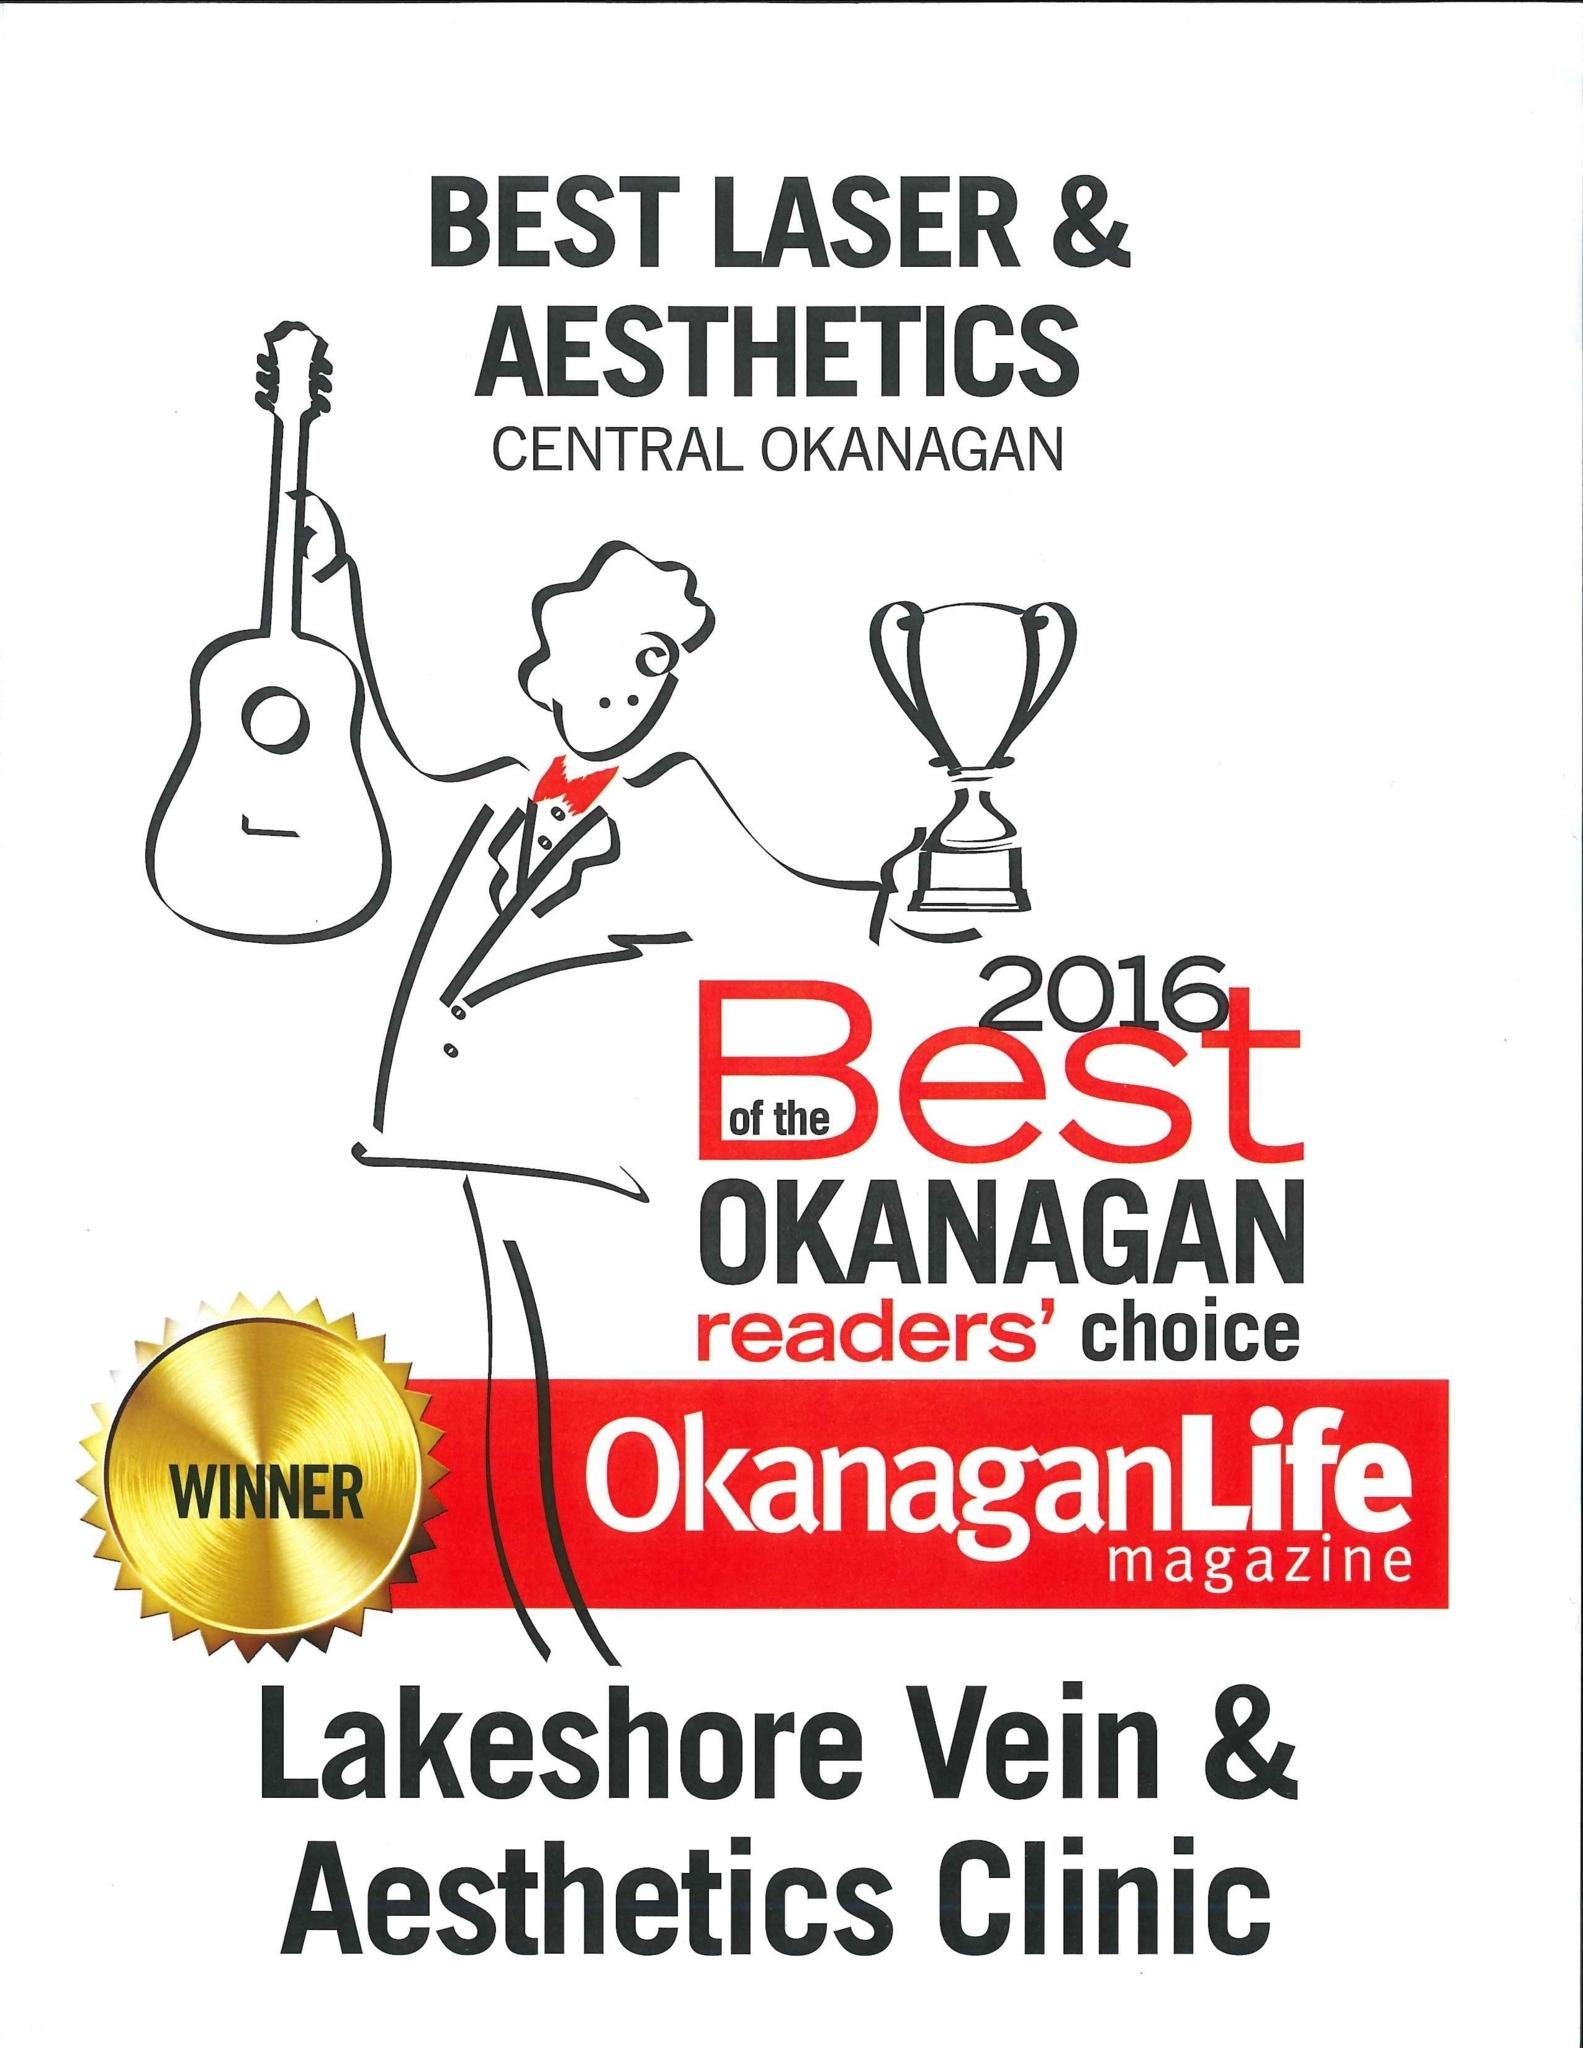 Lakeshore Vein & Aesthetics Clinic Inc